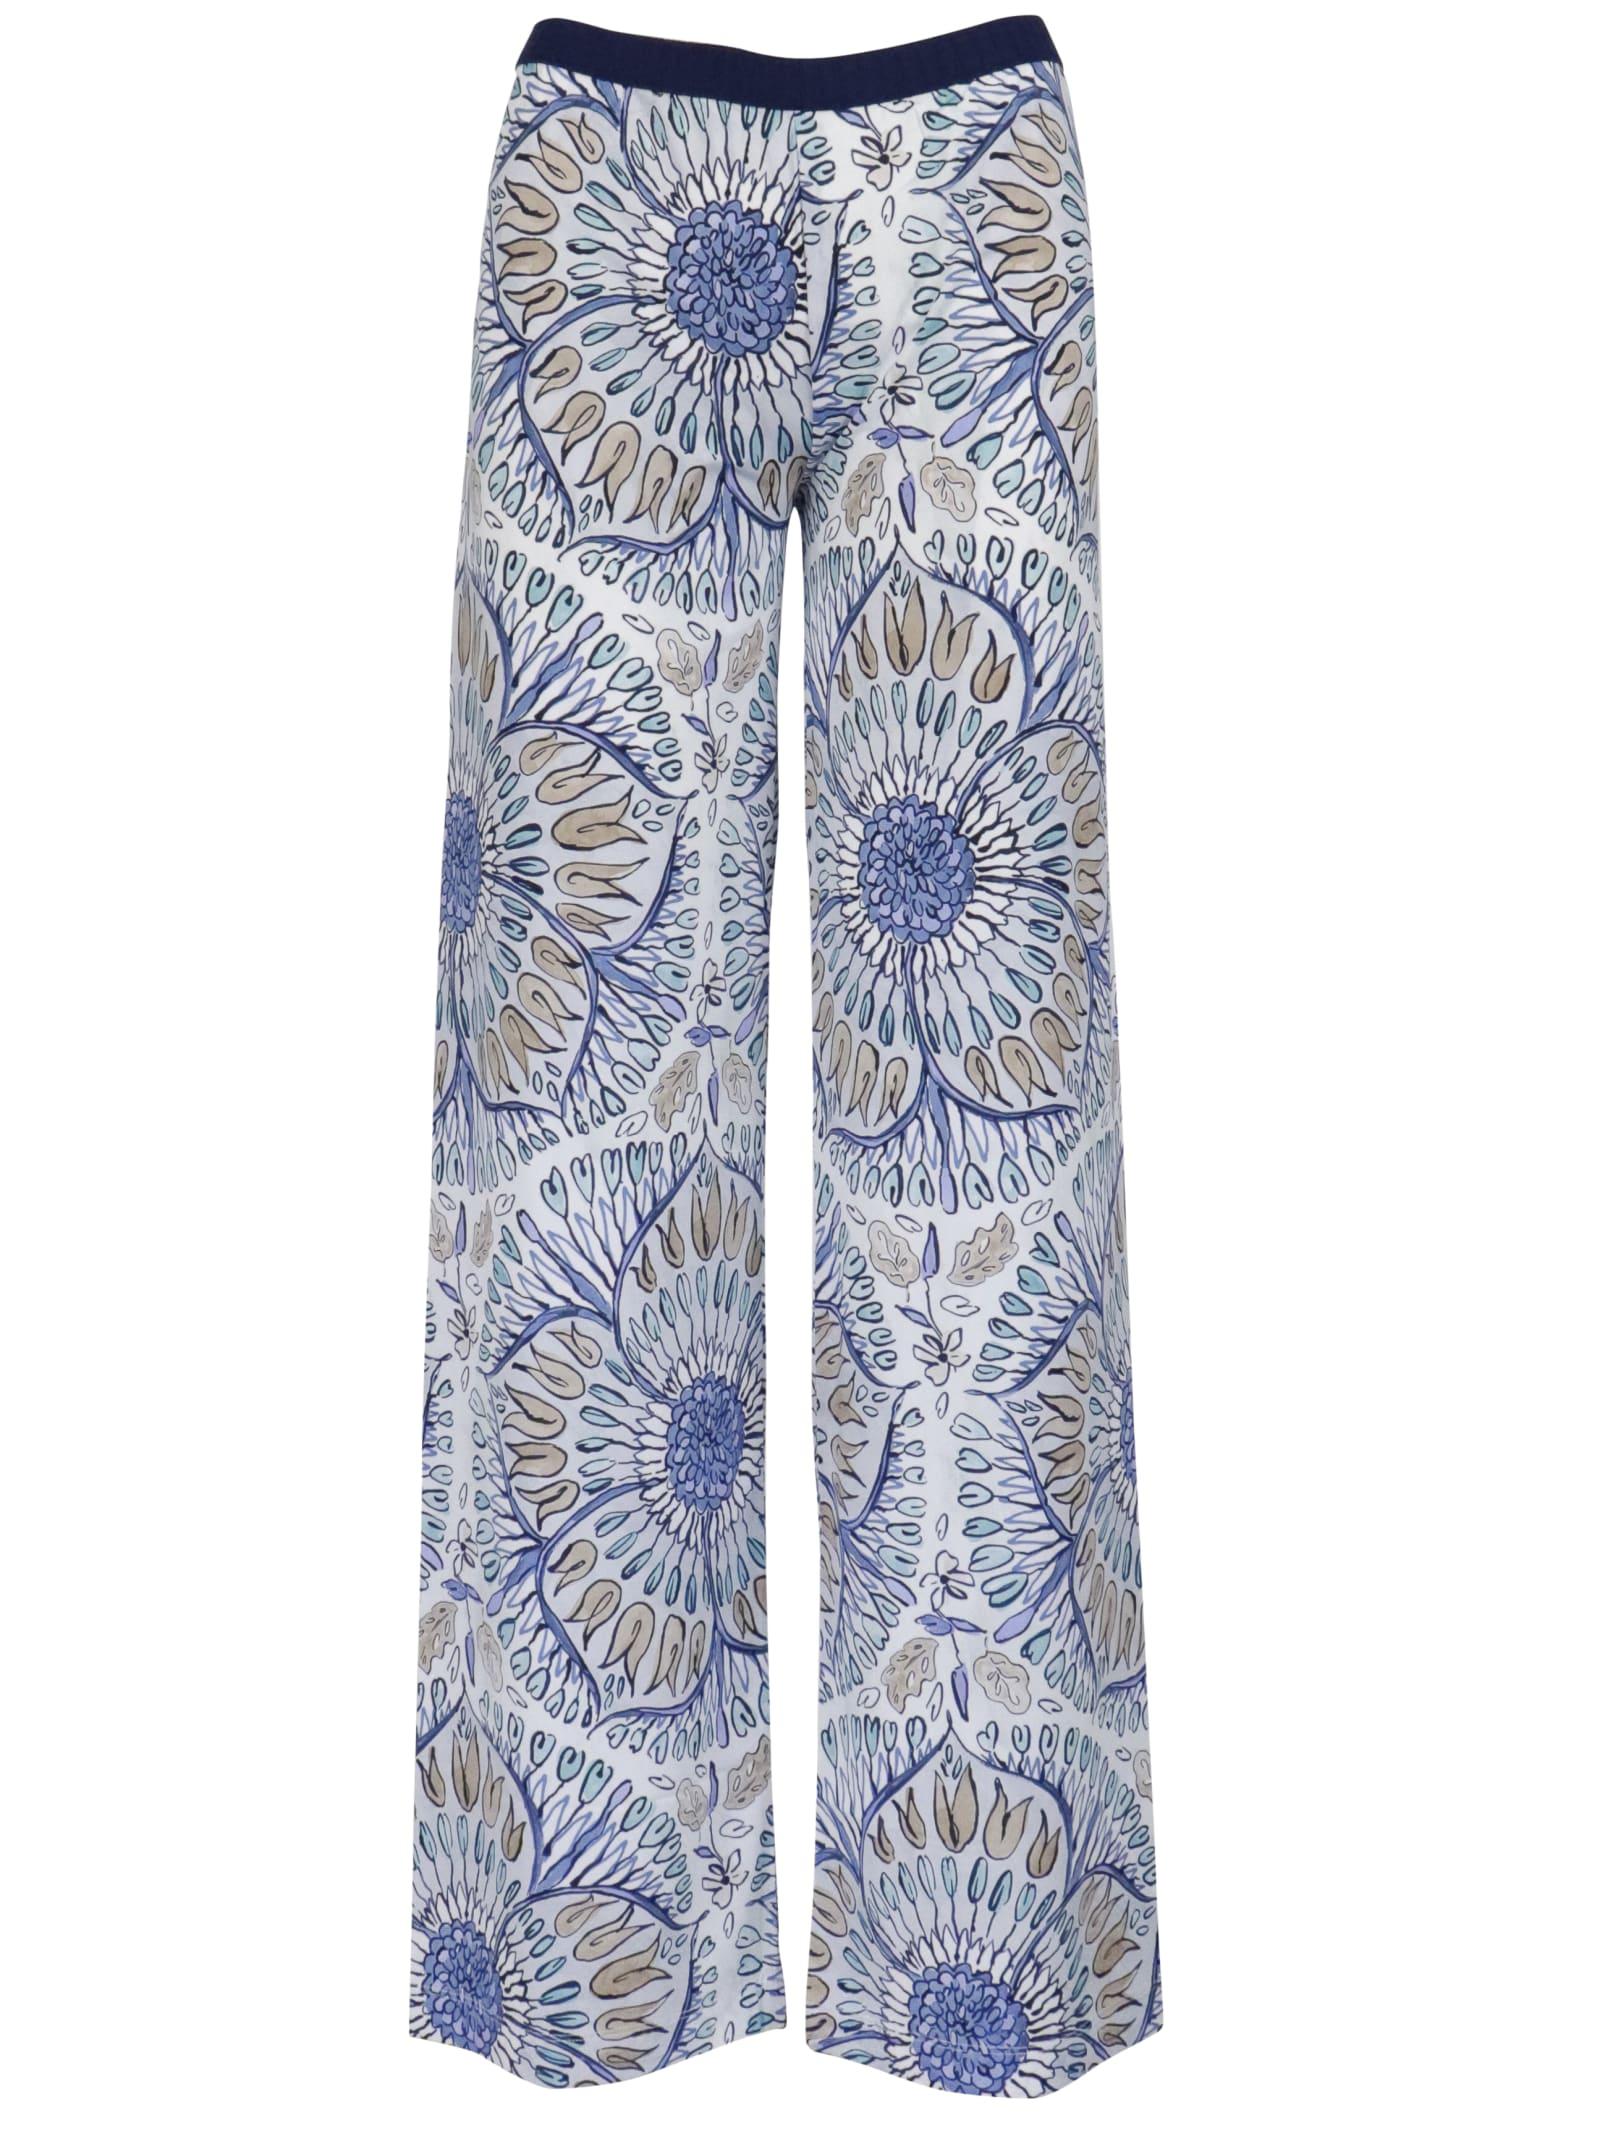 Malìparmi Welcome Summer Trousers